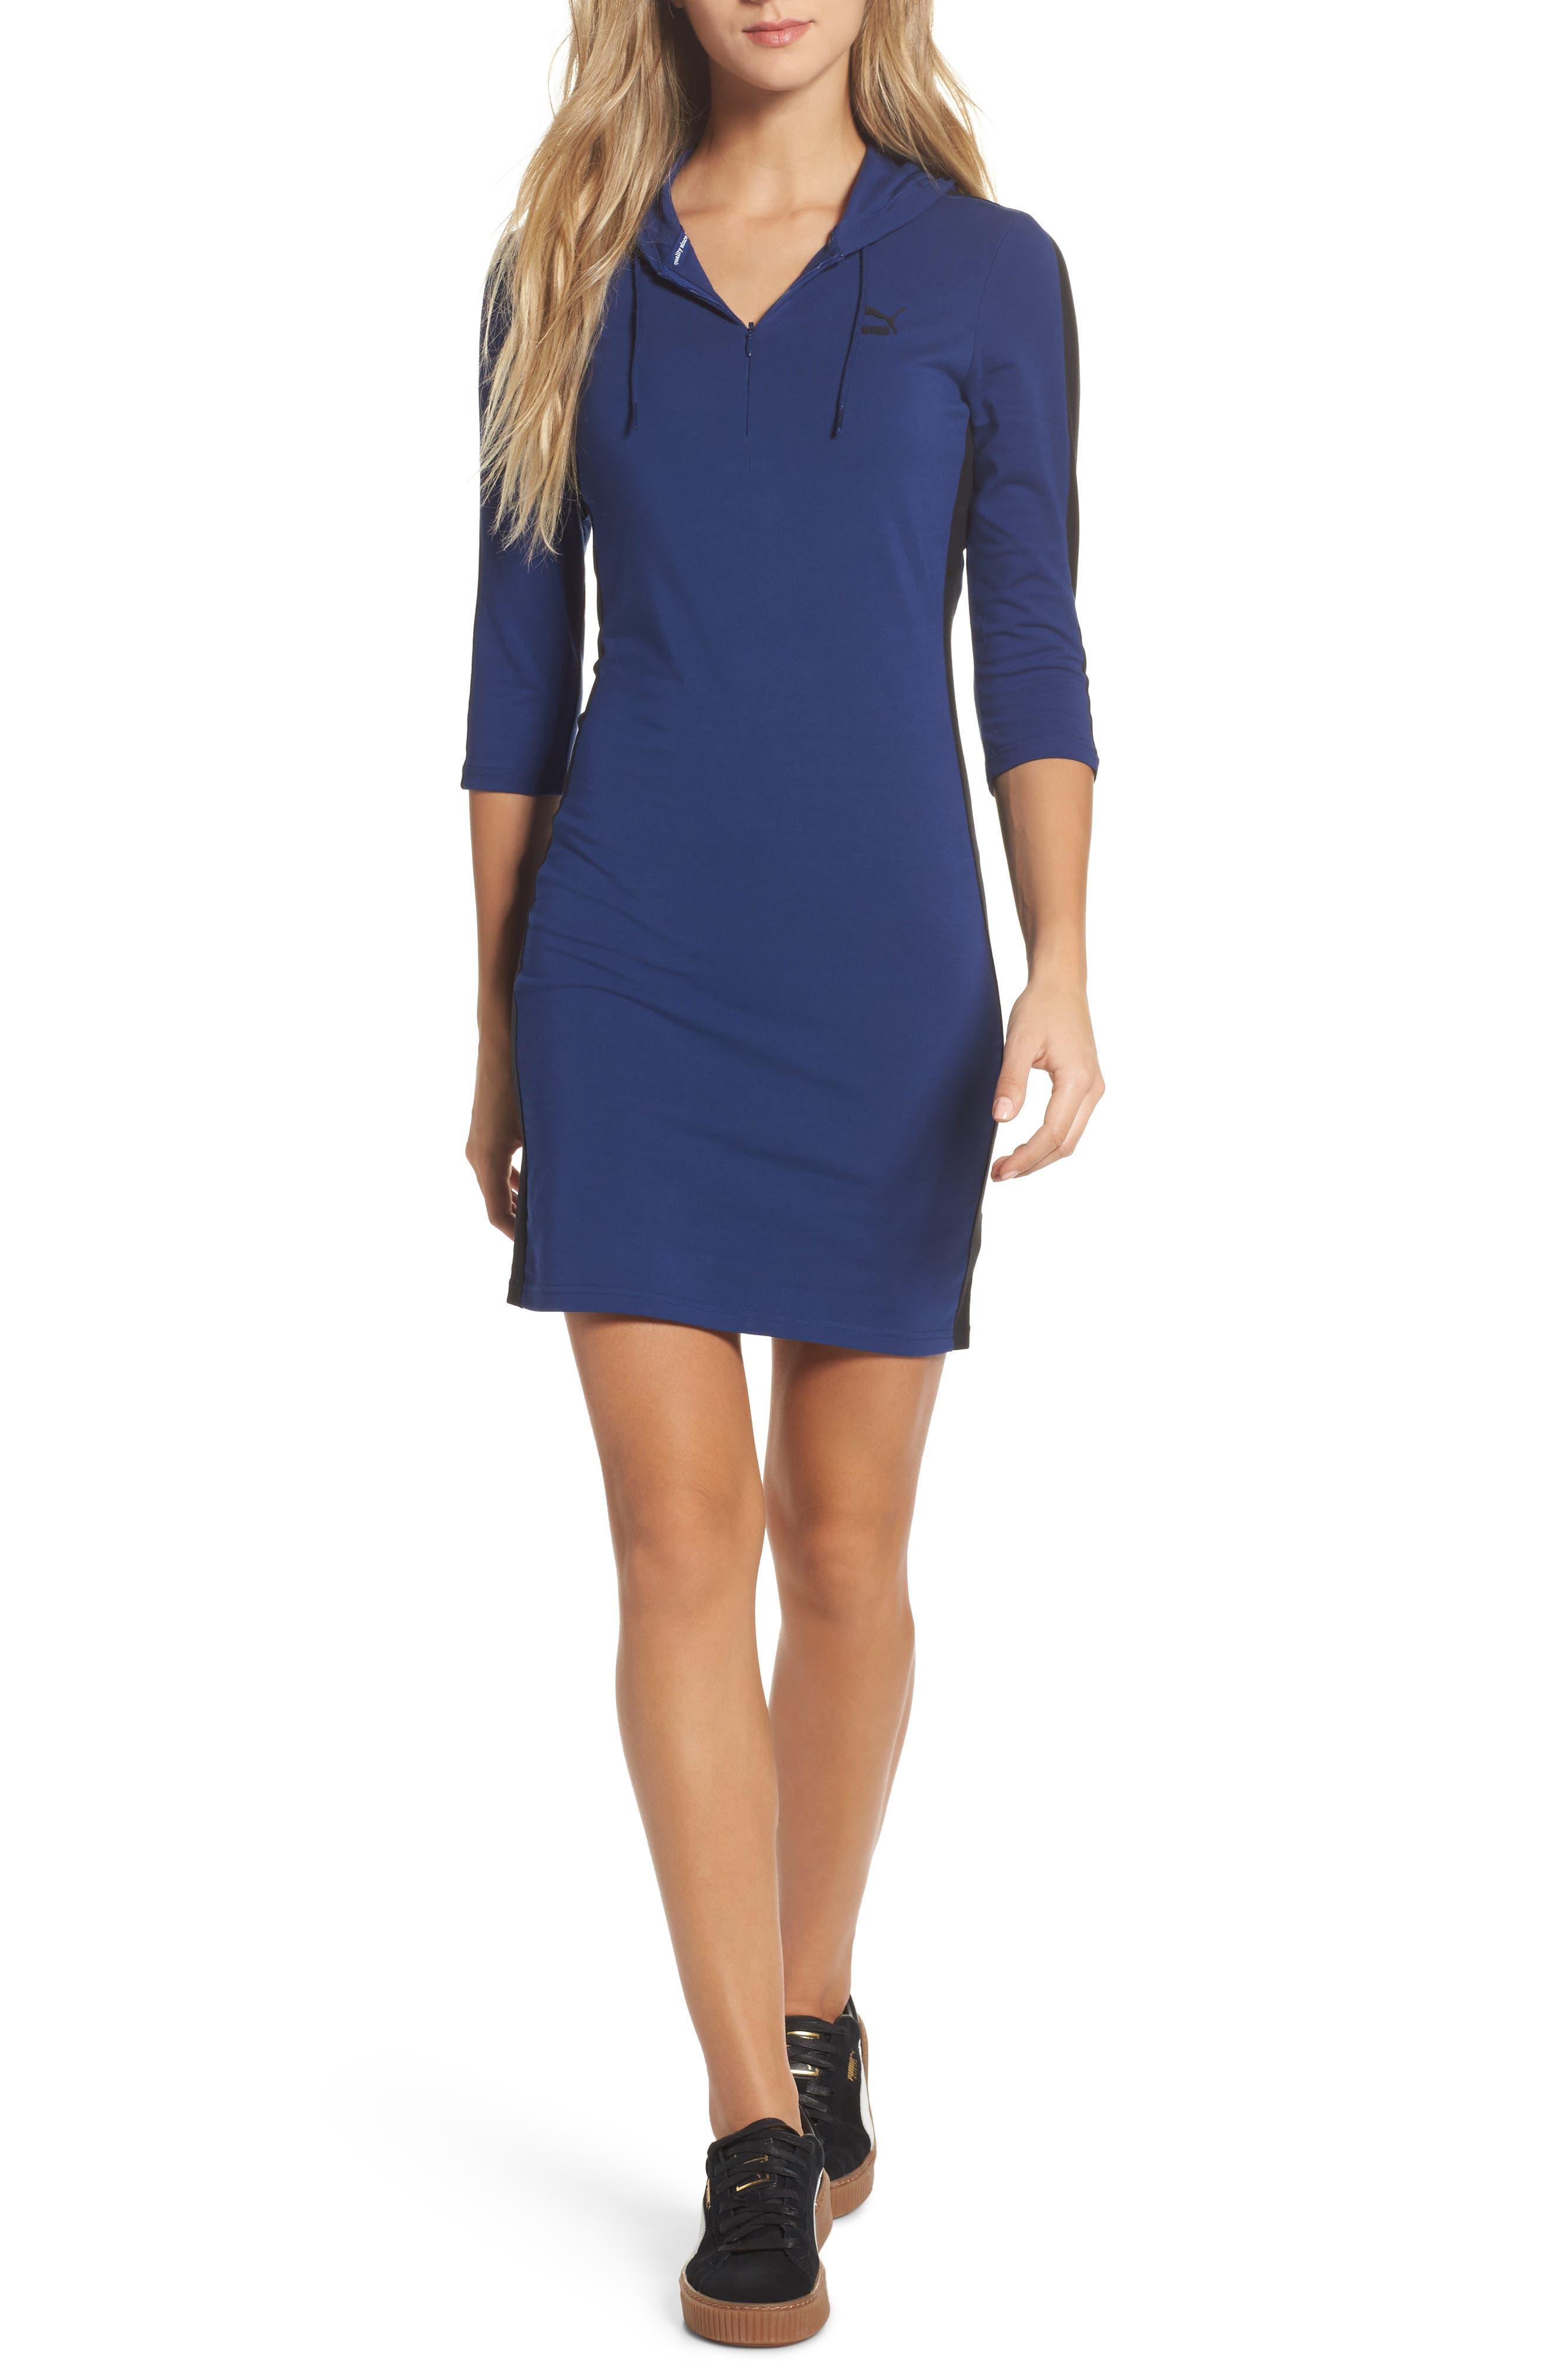 T7 Sweatshirt Dress,                             Main thumbnail 1, color,                             400